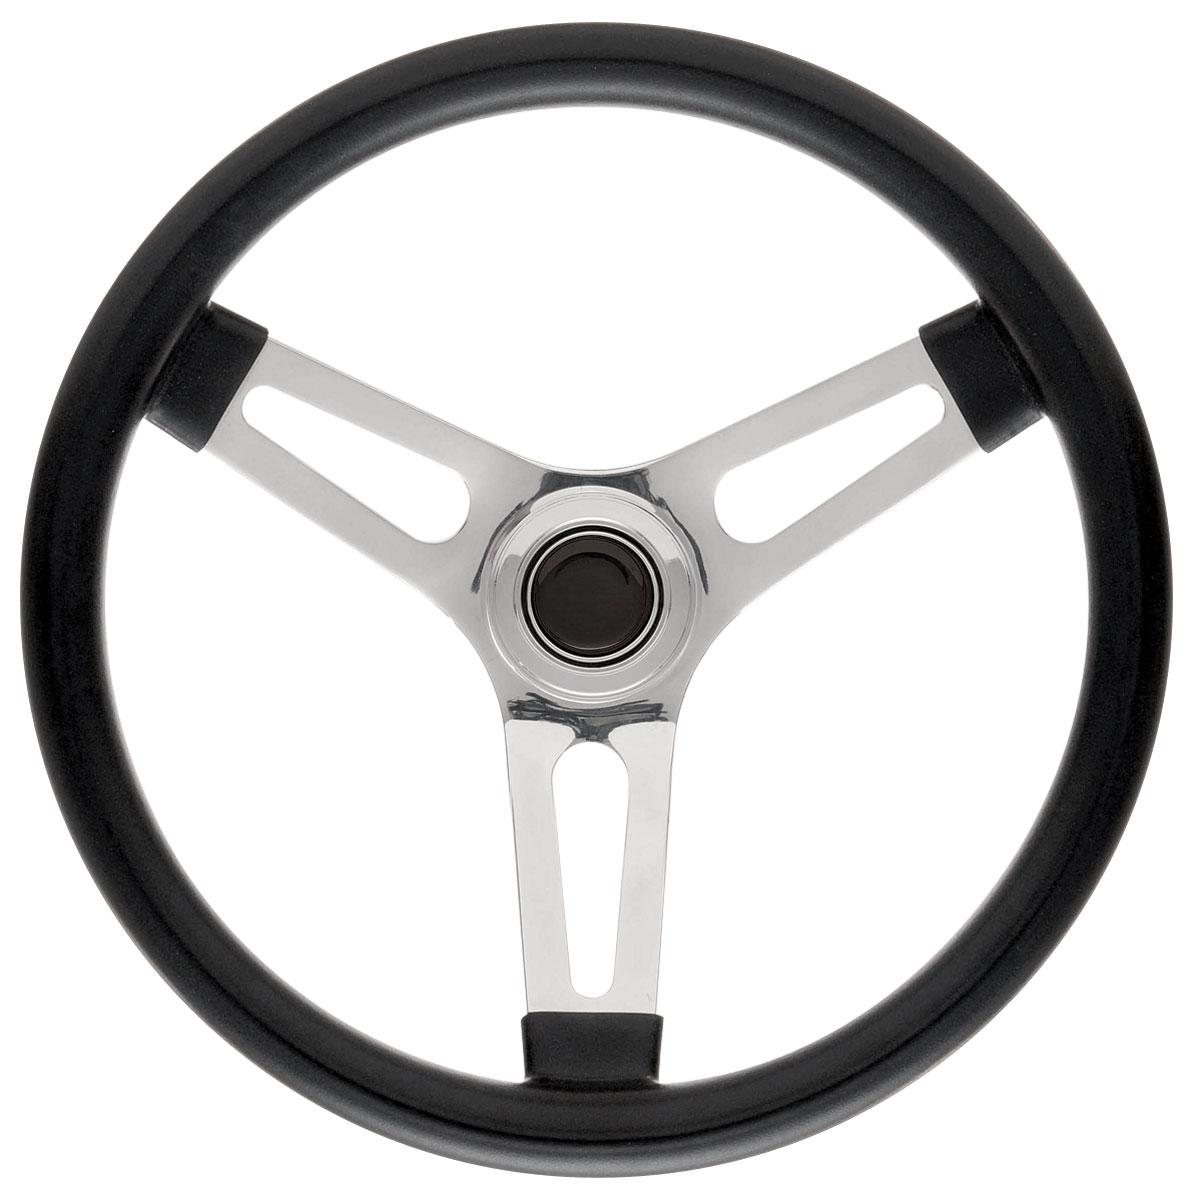 Steering Wheel Kit, 69-89 GM, Symm. Foam, 1.5, Tall Cap, Plain, Black